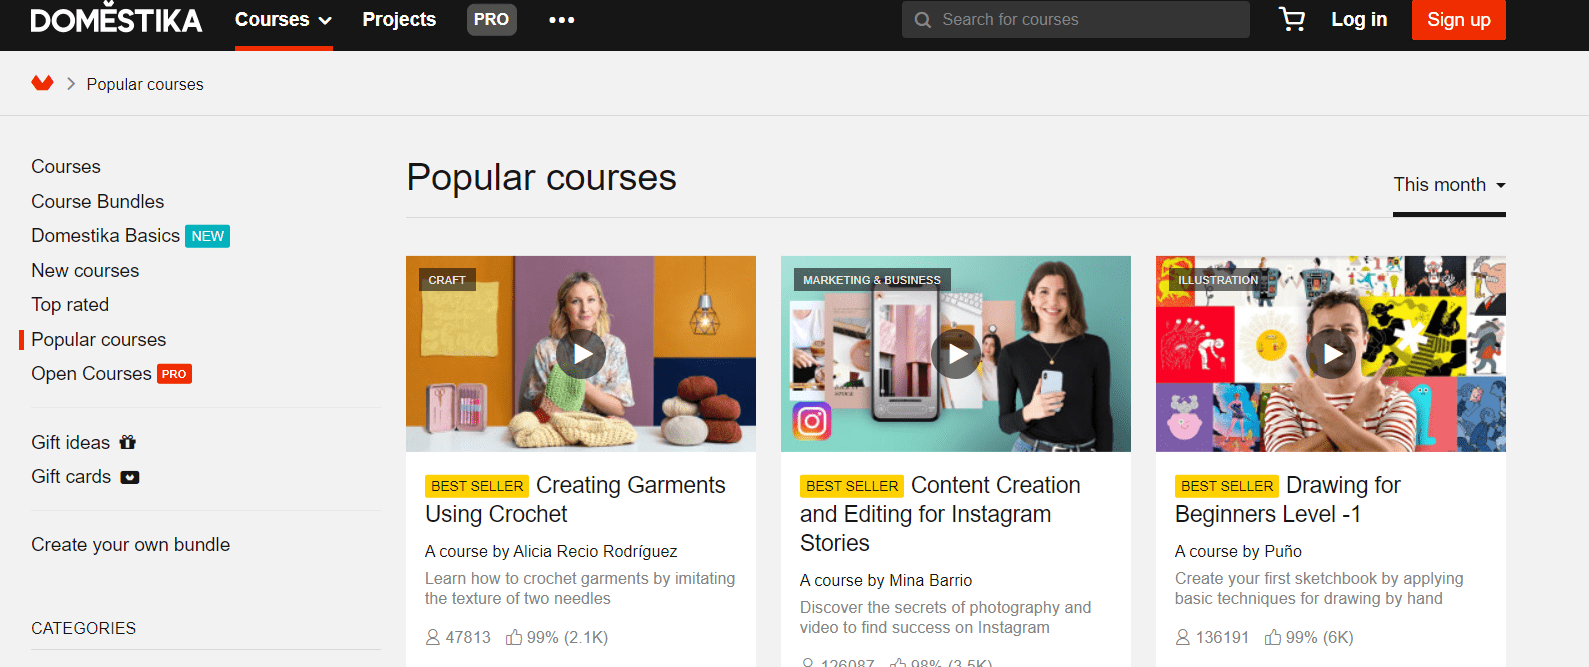 popular courses on Domestika